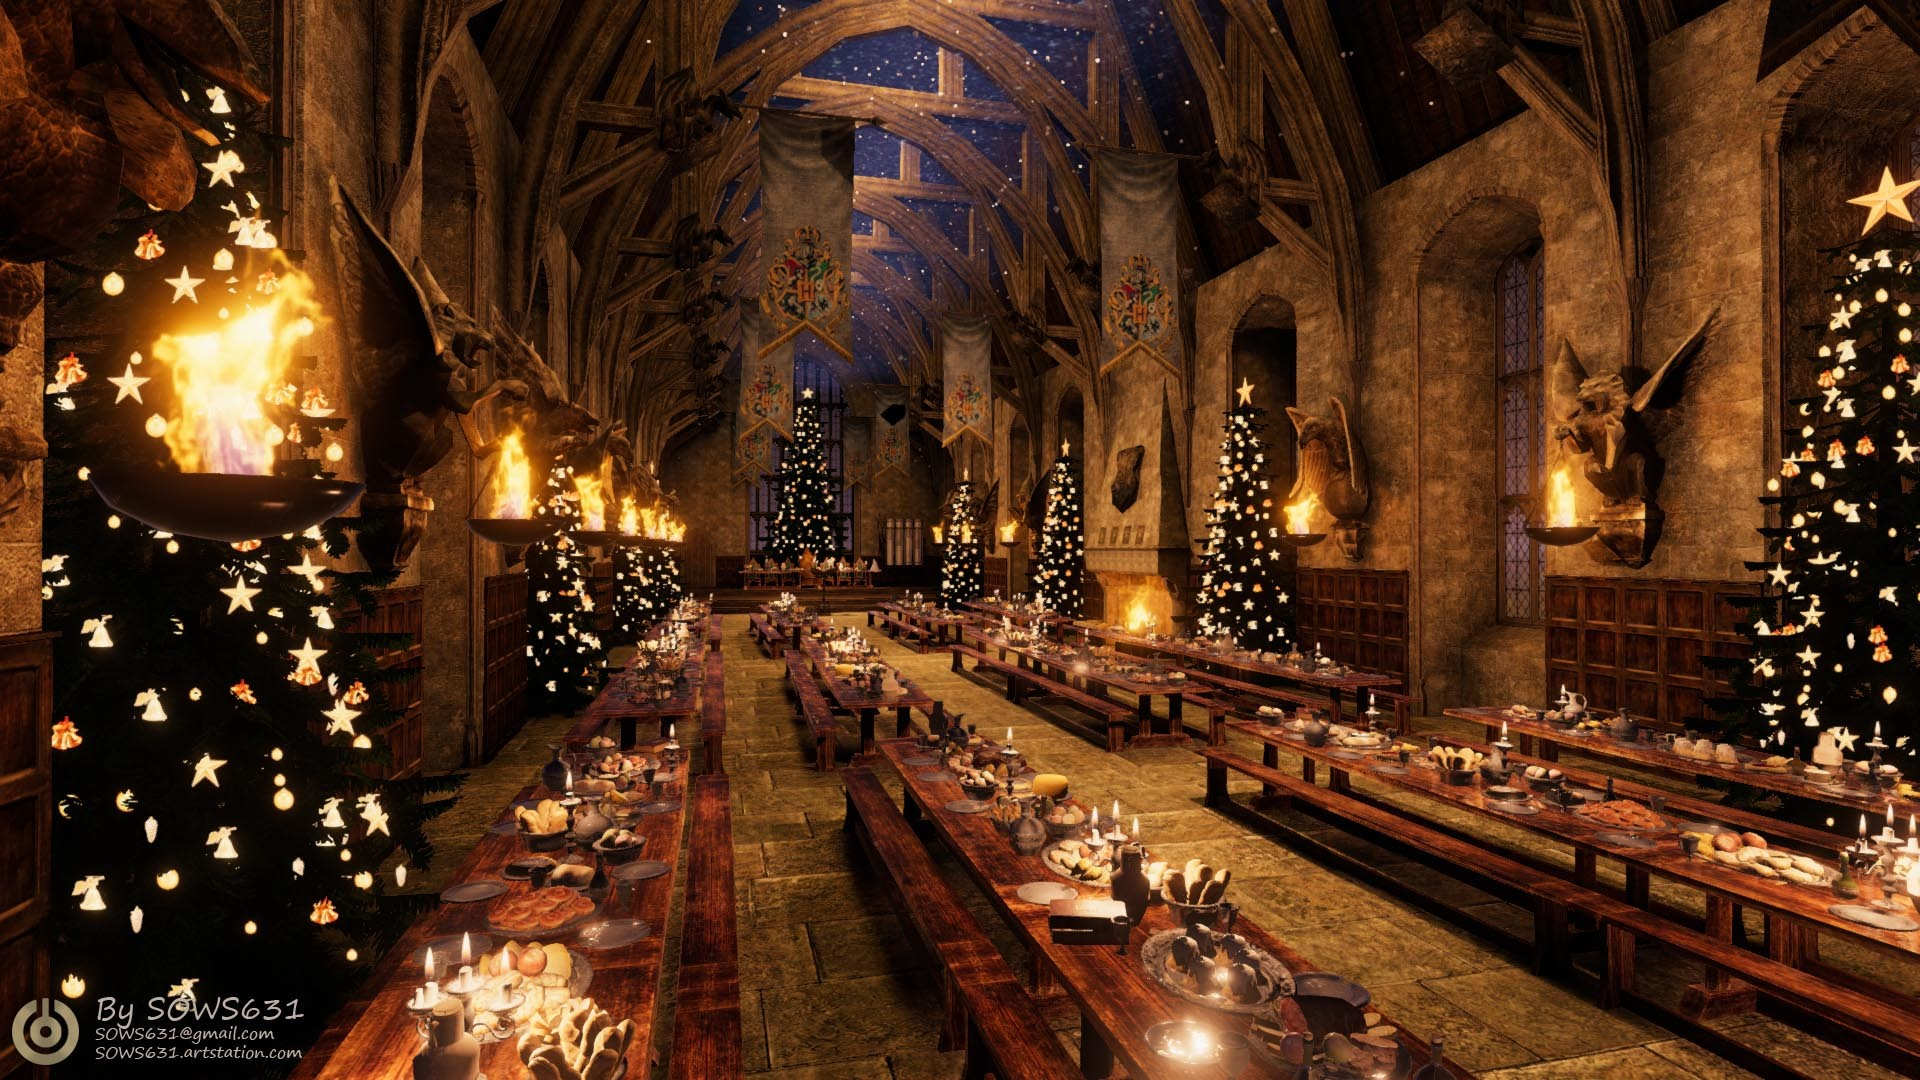 Harry Potter Christmas Wallpaper - 1920x1080 - Download HD Wallpaper -  WallpaperTip